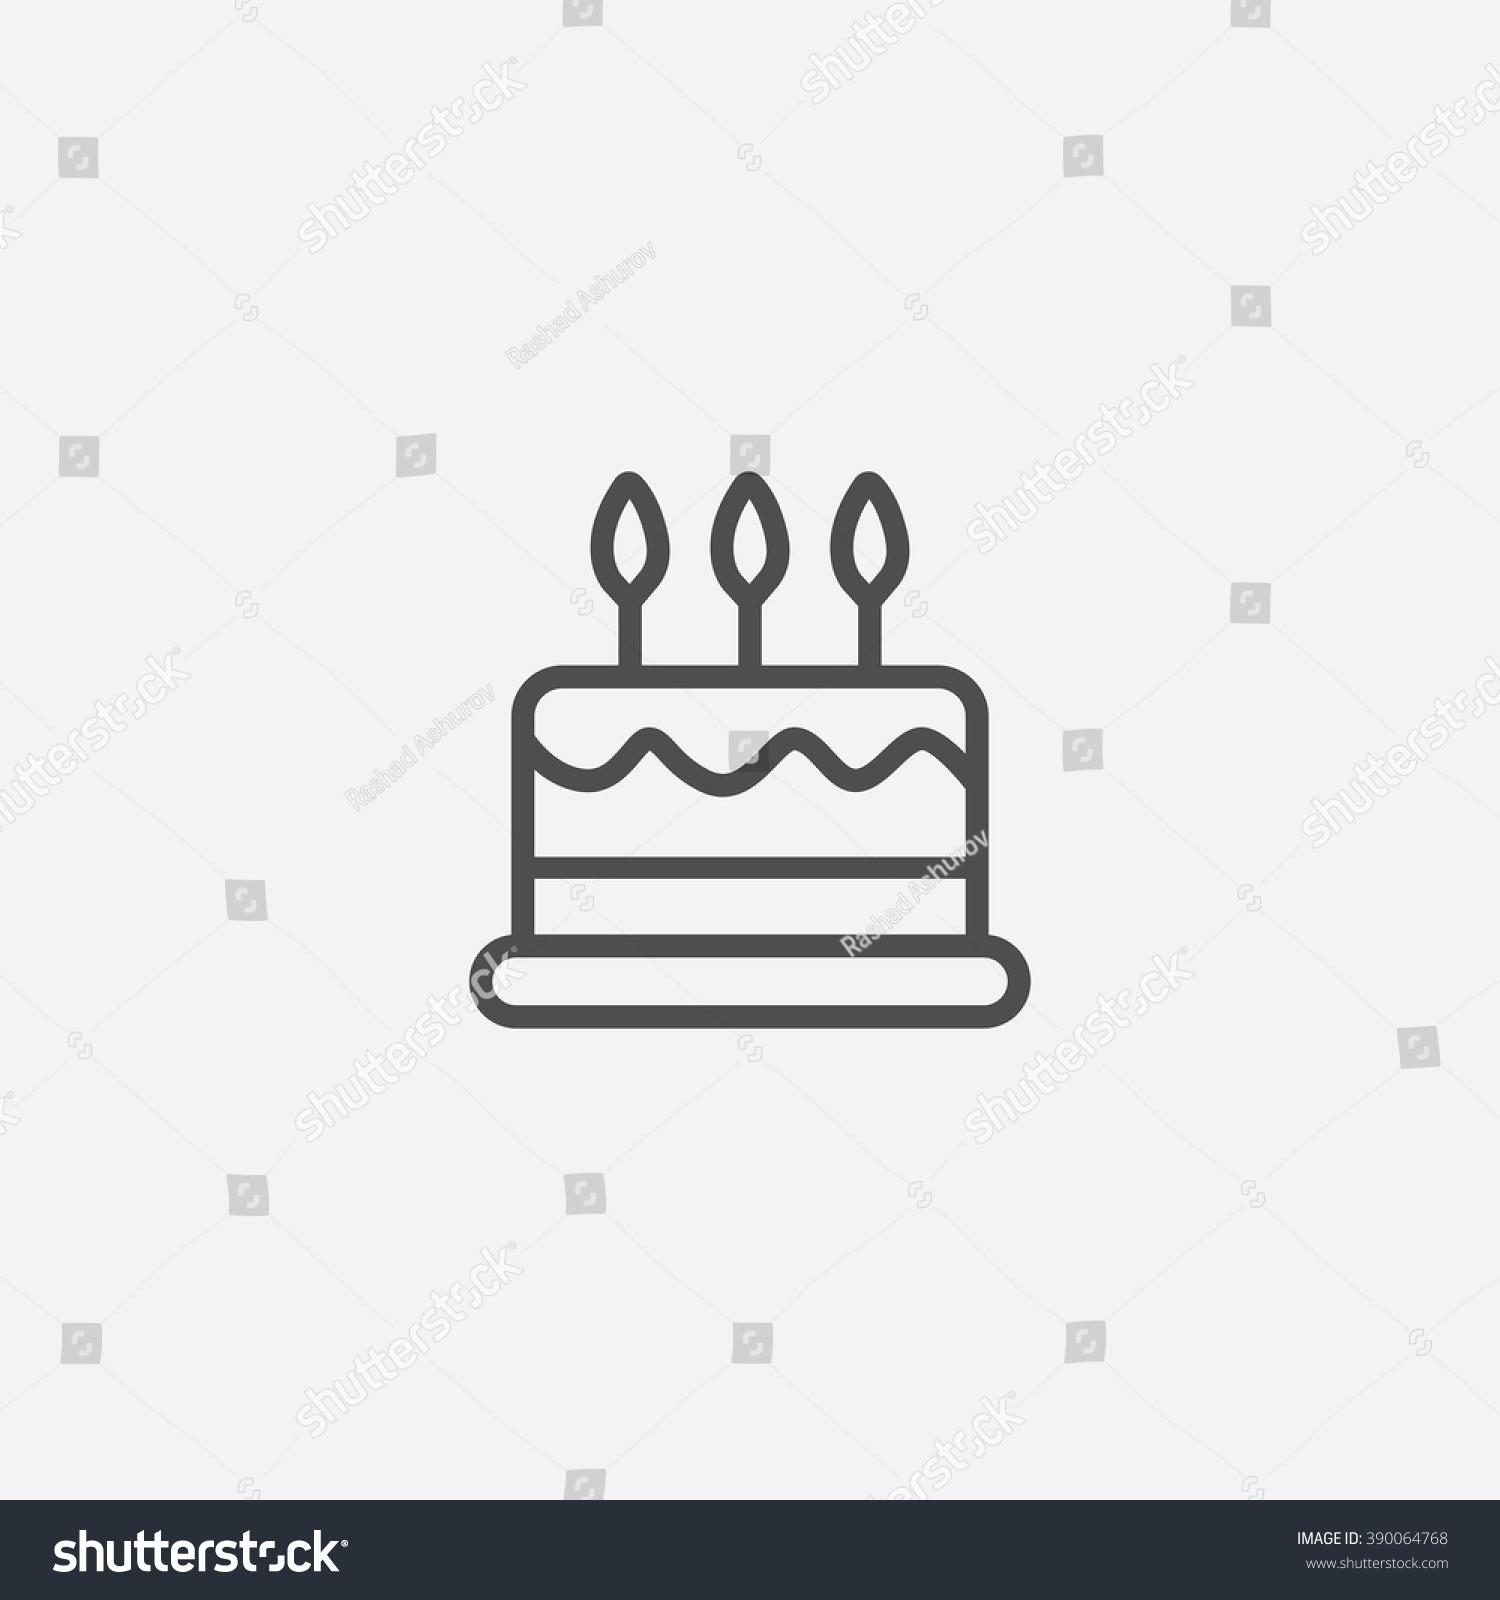 Cake Line Art Vector Free Download : Line Cake Icon Stock Vector 390064768 - Shutterstock